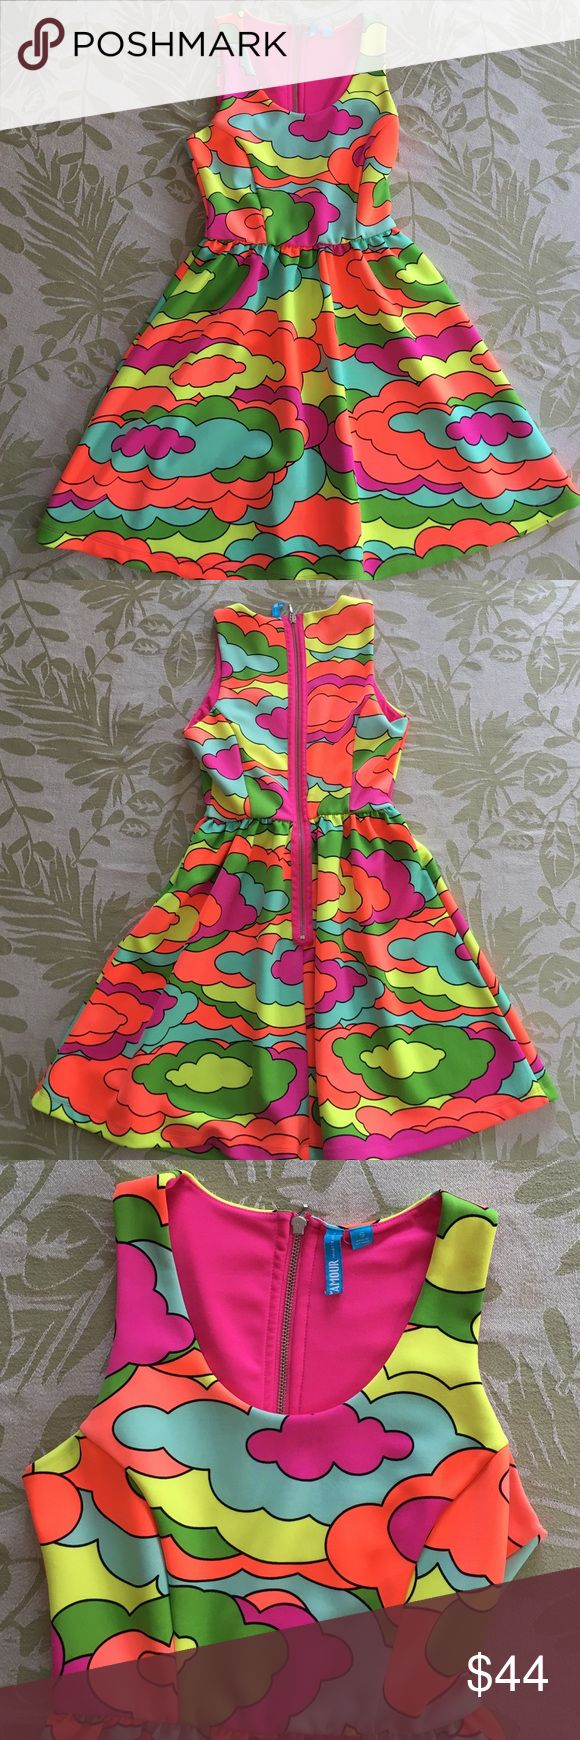 Nanette Lepore Neon color dress Small Beautiful Nanette dress with multi neon colors in clods shapes. Back zipper. Elastic waistband. 93% polyester 7% spandex Nanette Lepore Dresses Mini